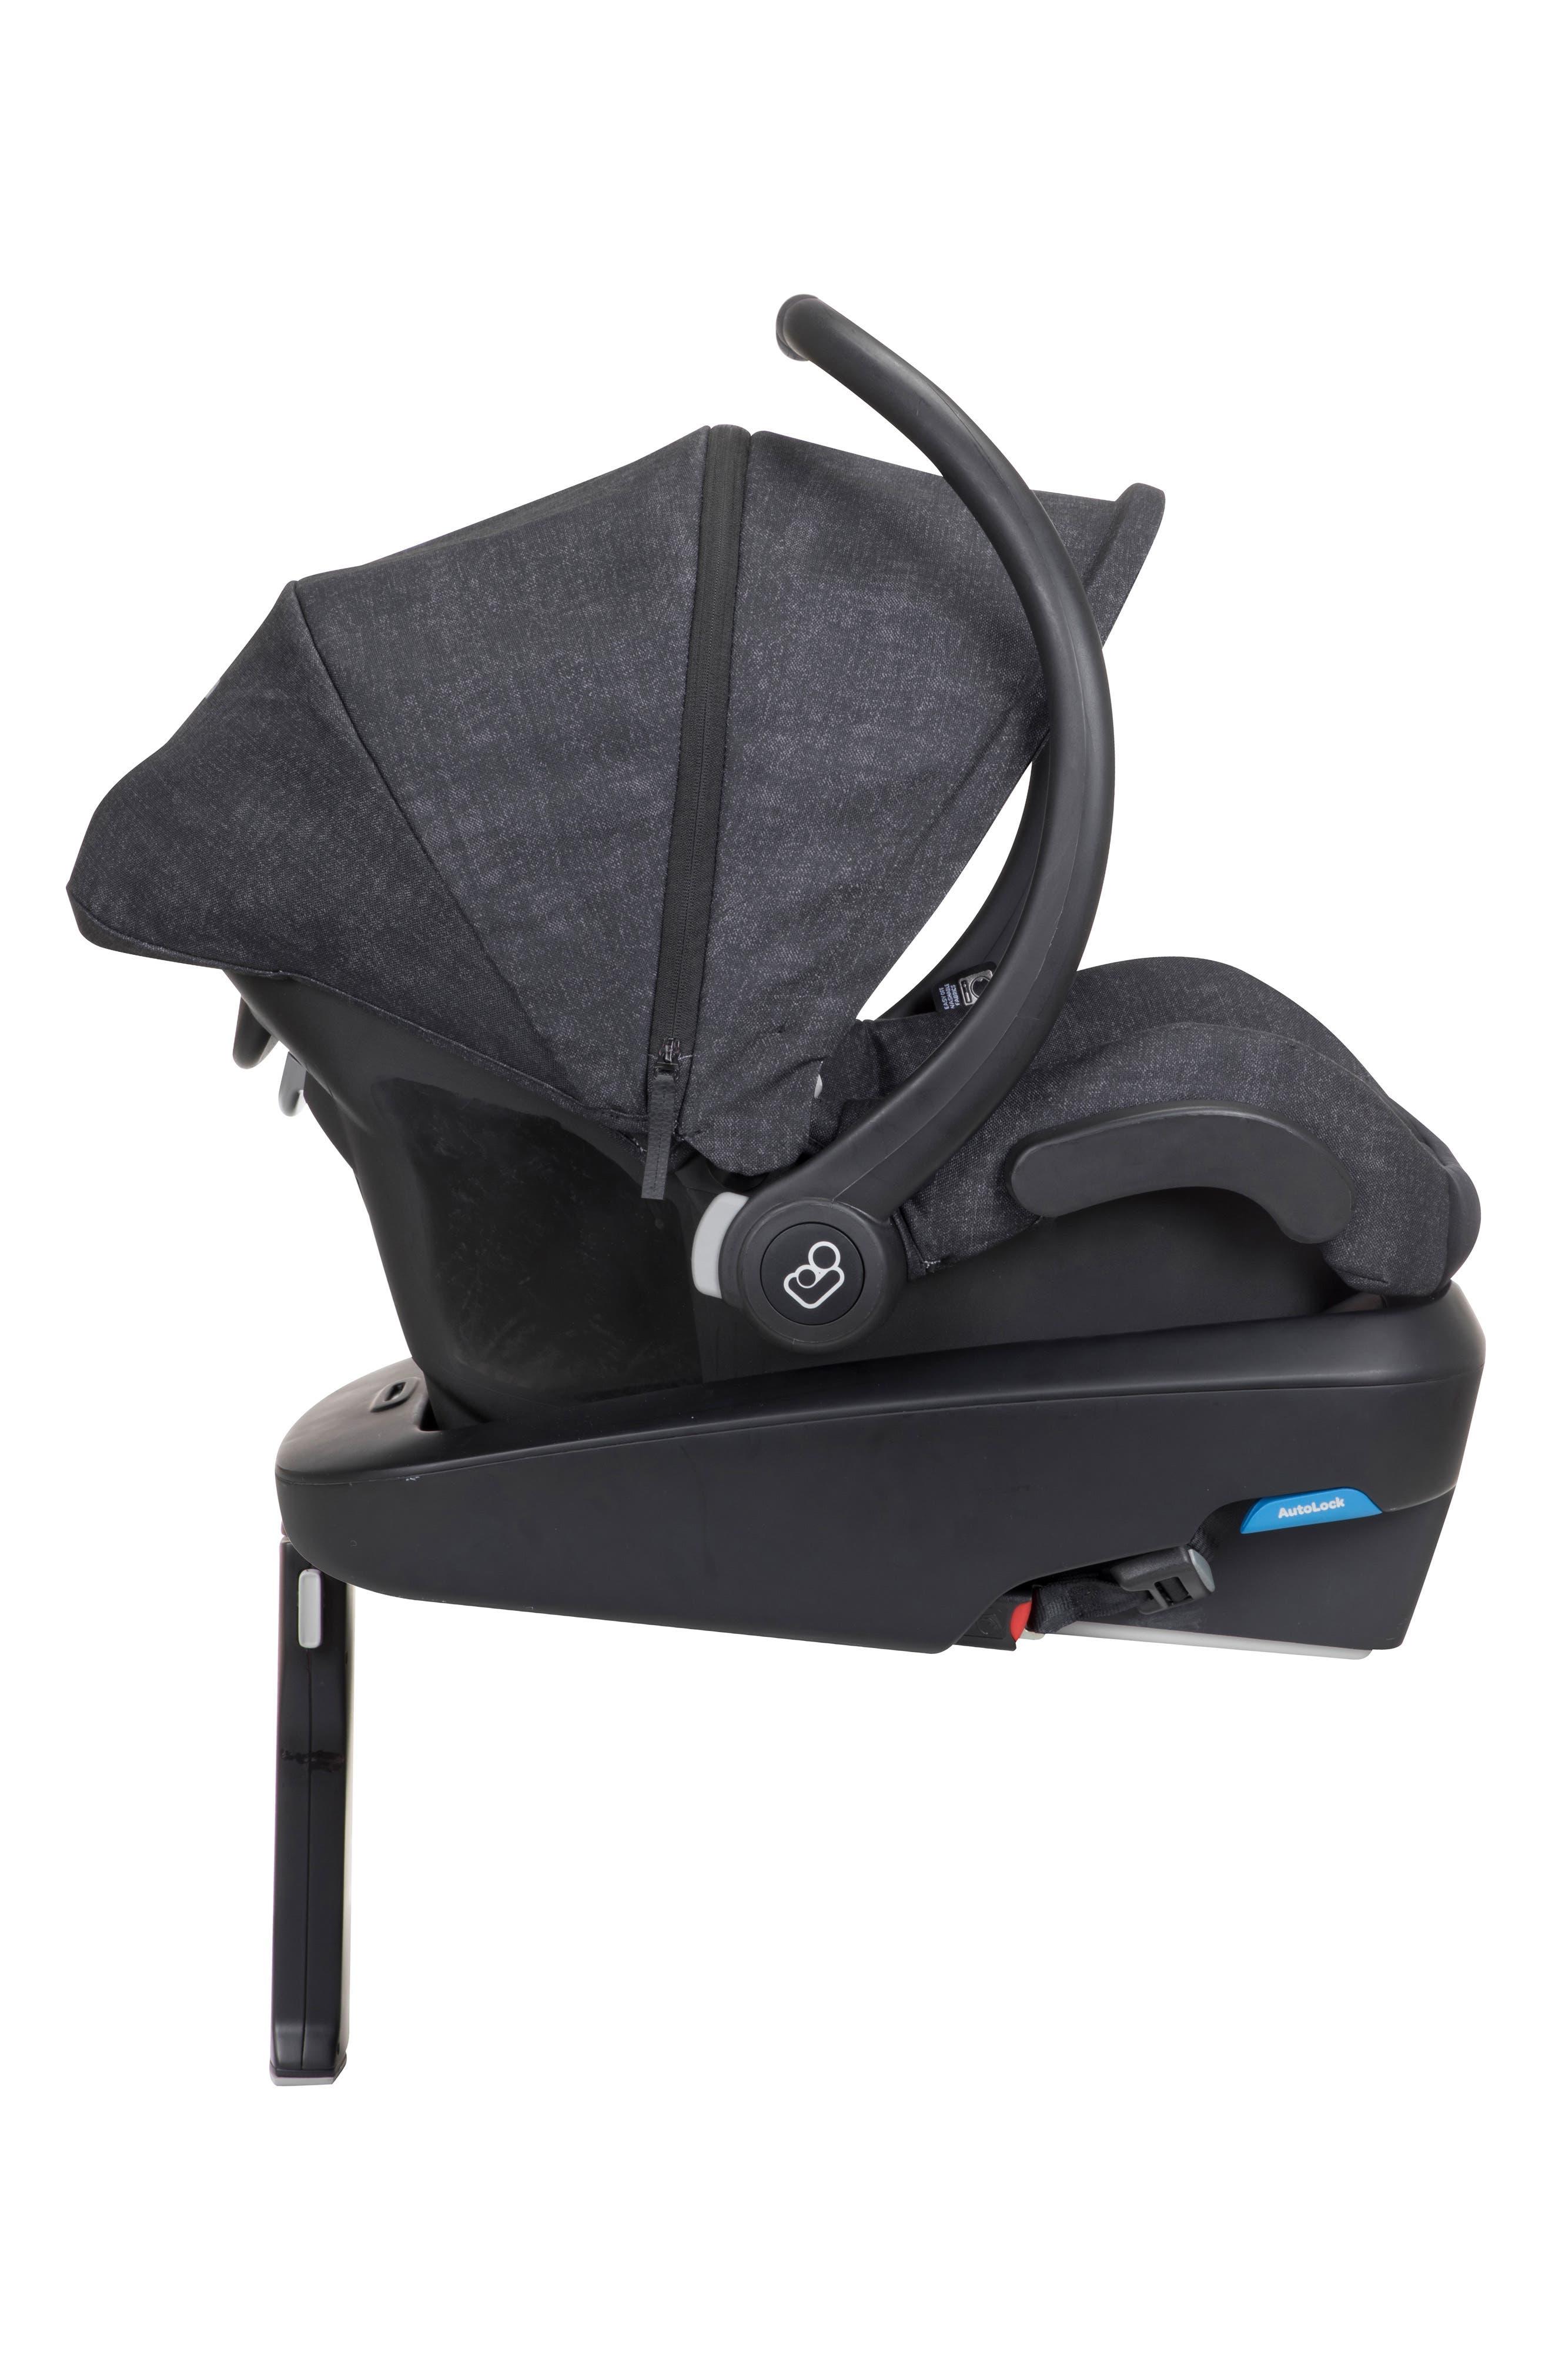 Mico Max Plus Infant Car Seat,                             Alternate thumbnail 10, color,                             NOMAD BLACK